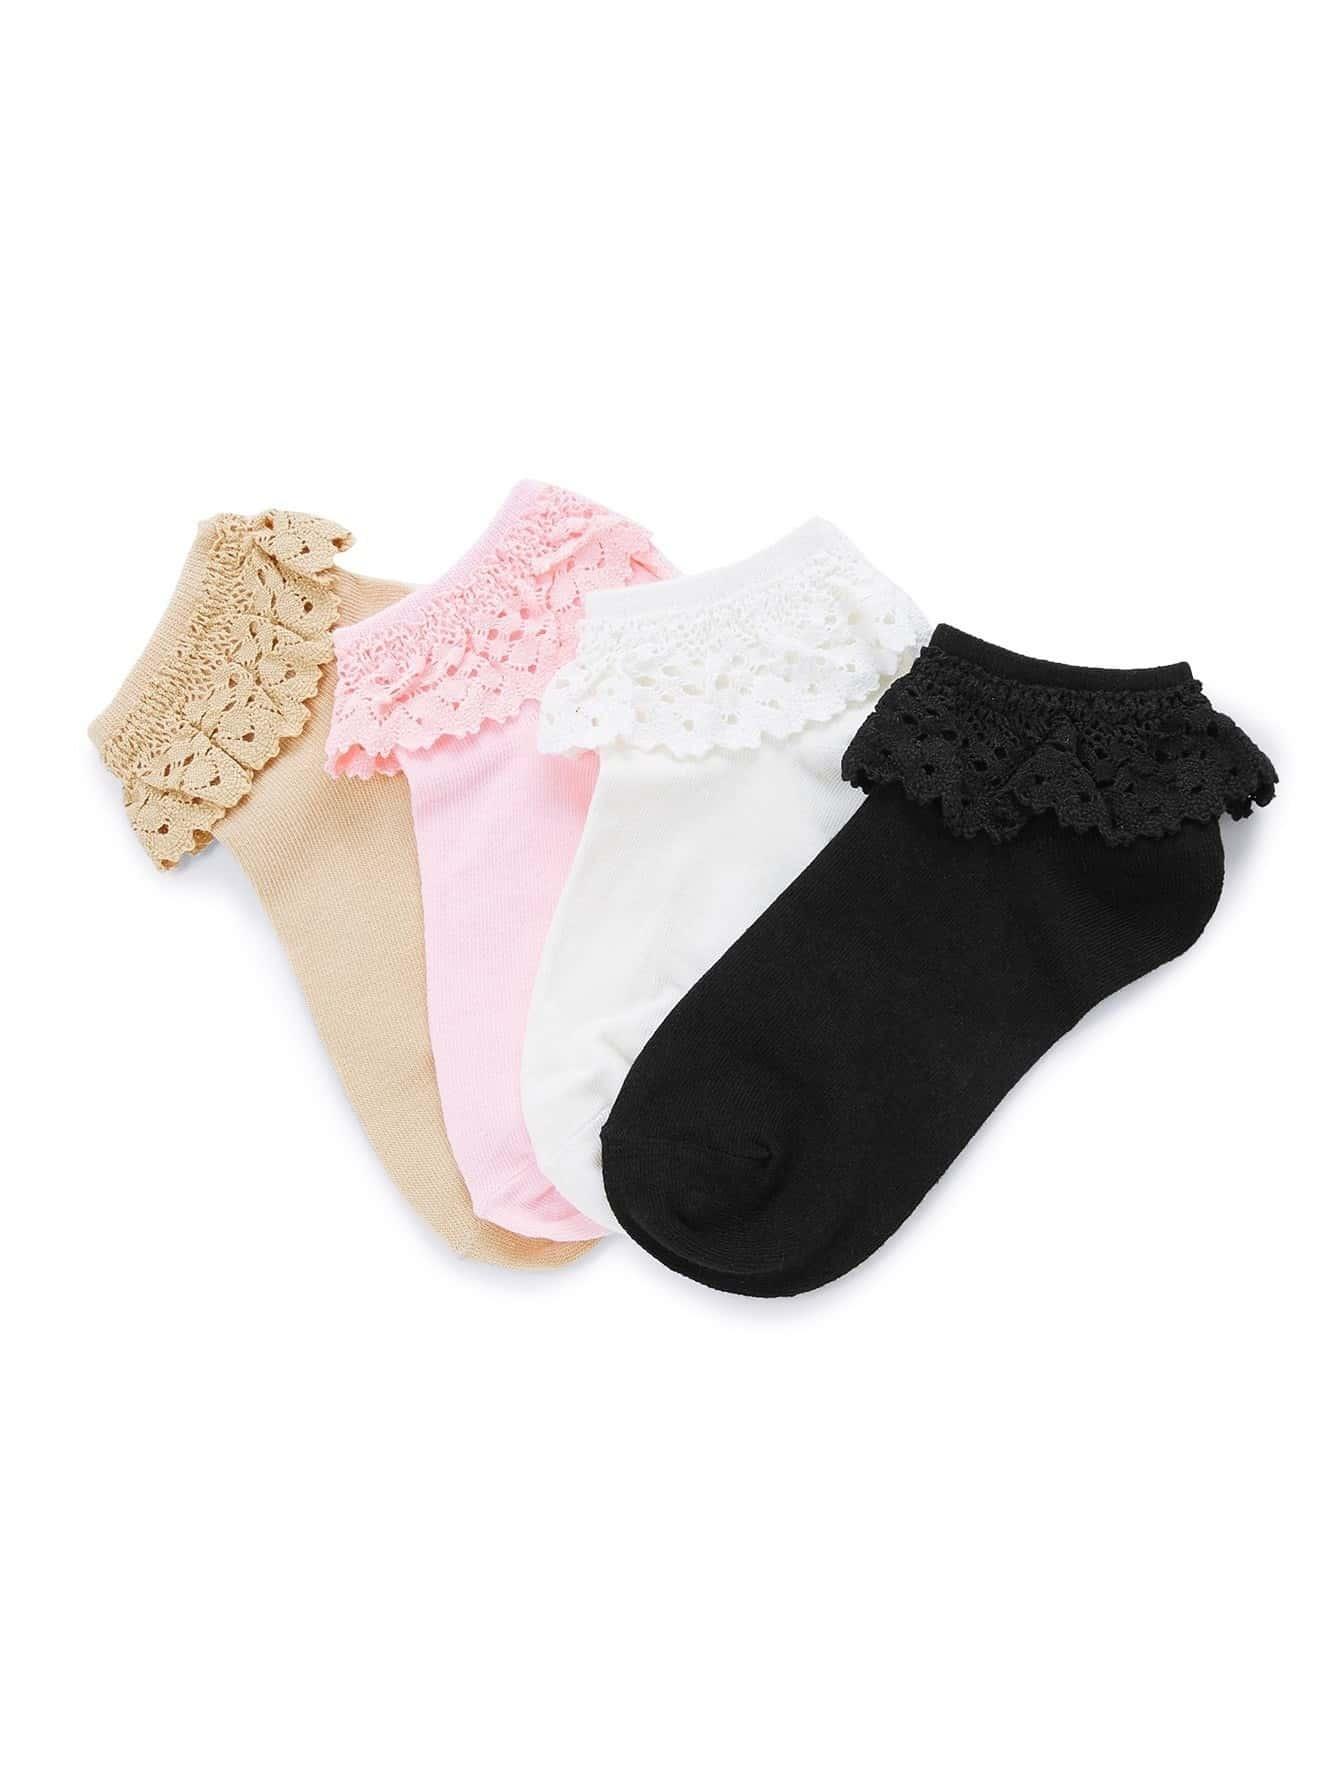 Ruffle Trim Ankle Socks 4pairs